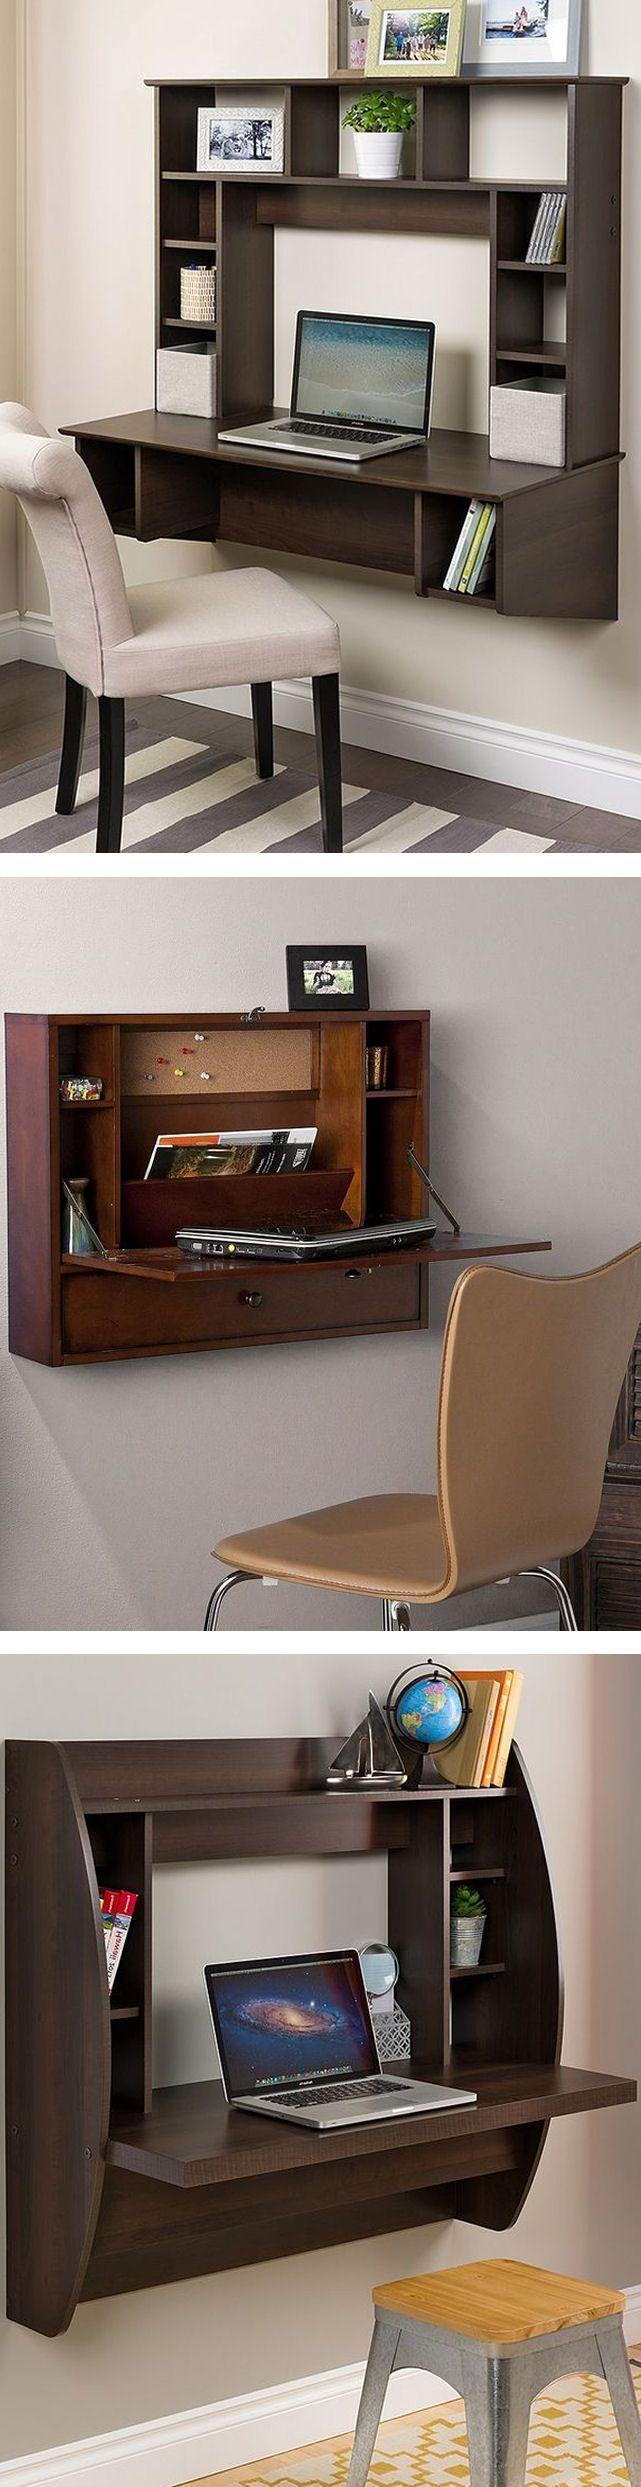 Плавающий Настенный стол // #office #decor #spacesaving: